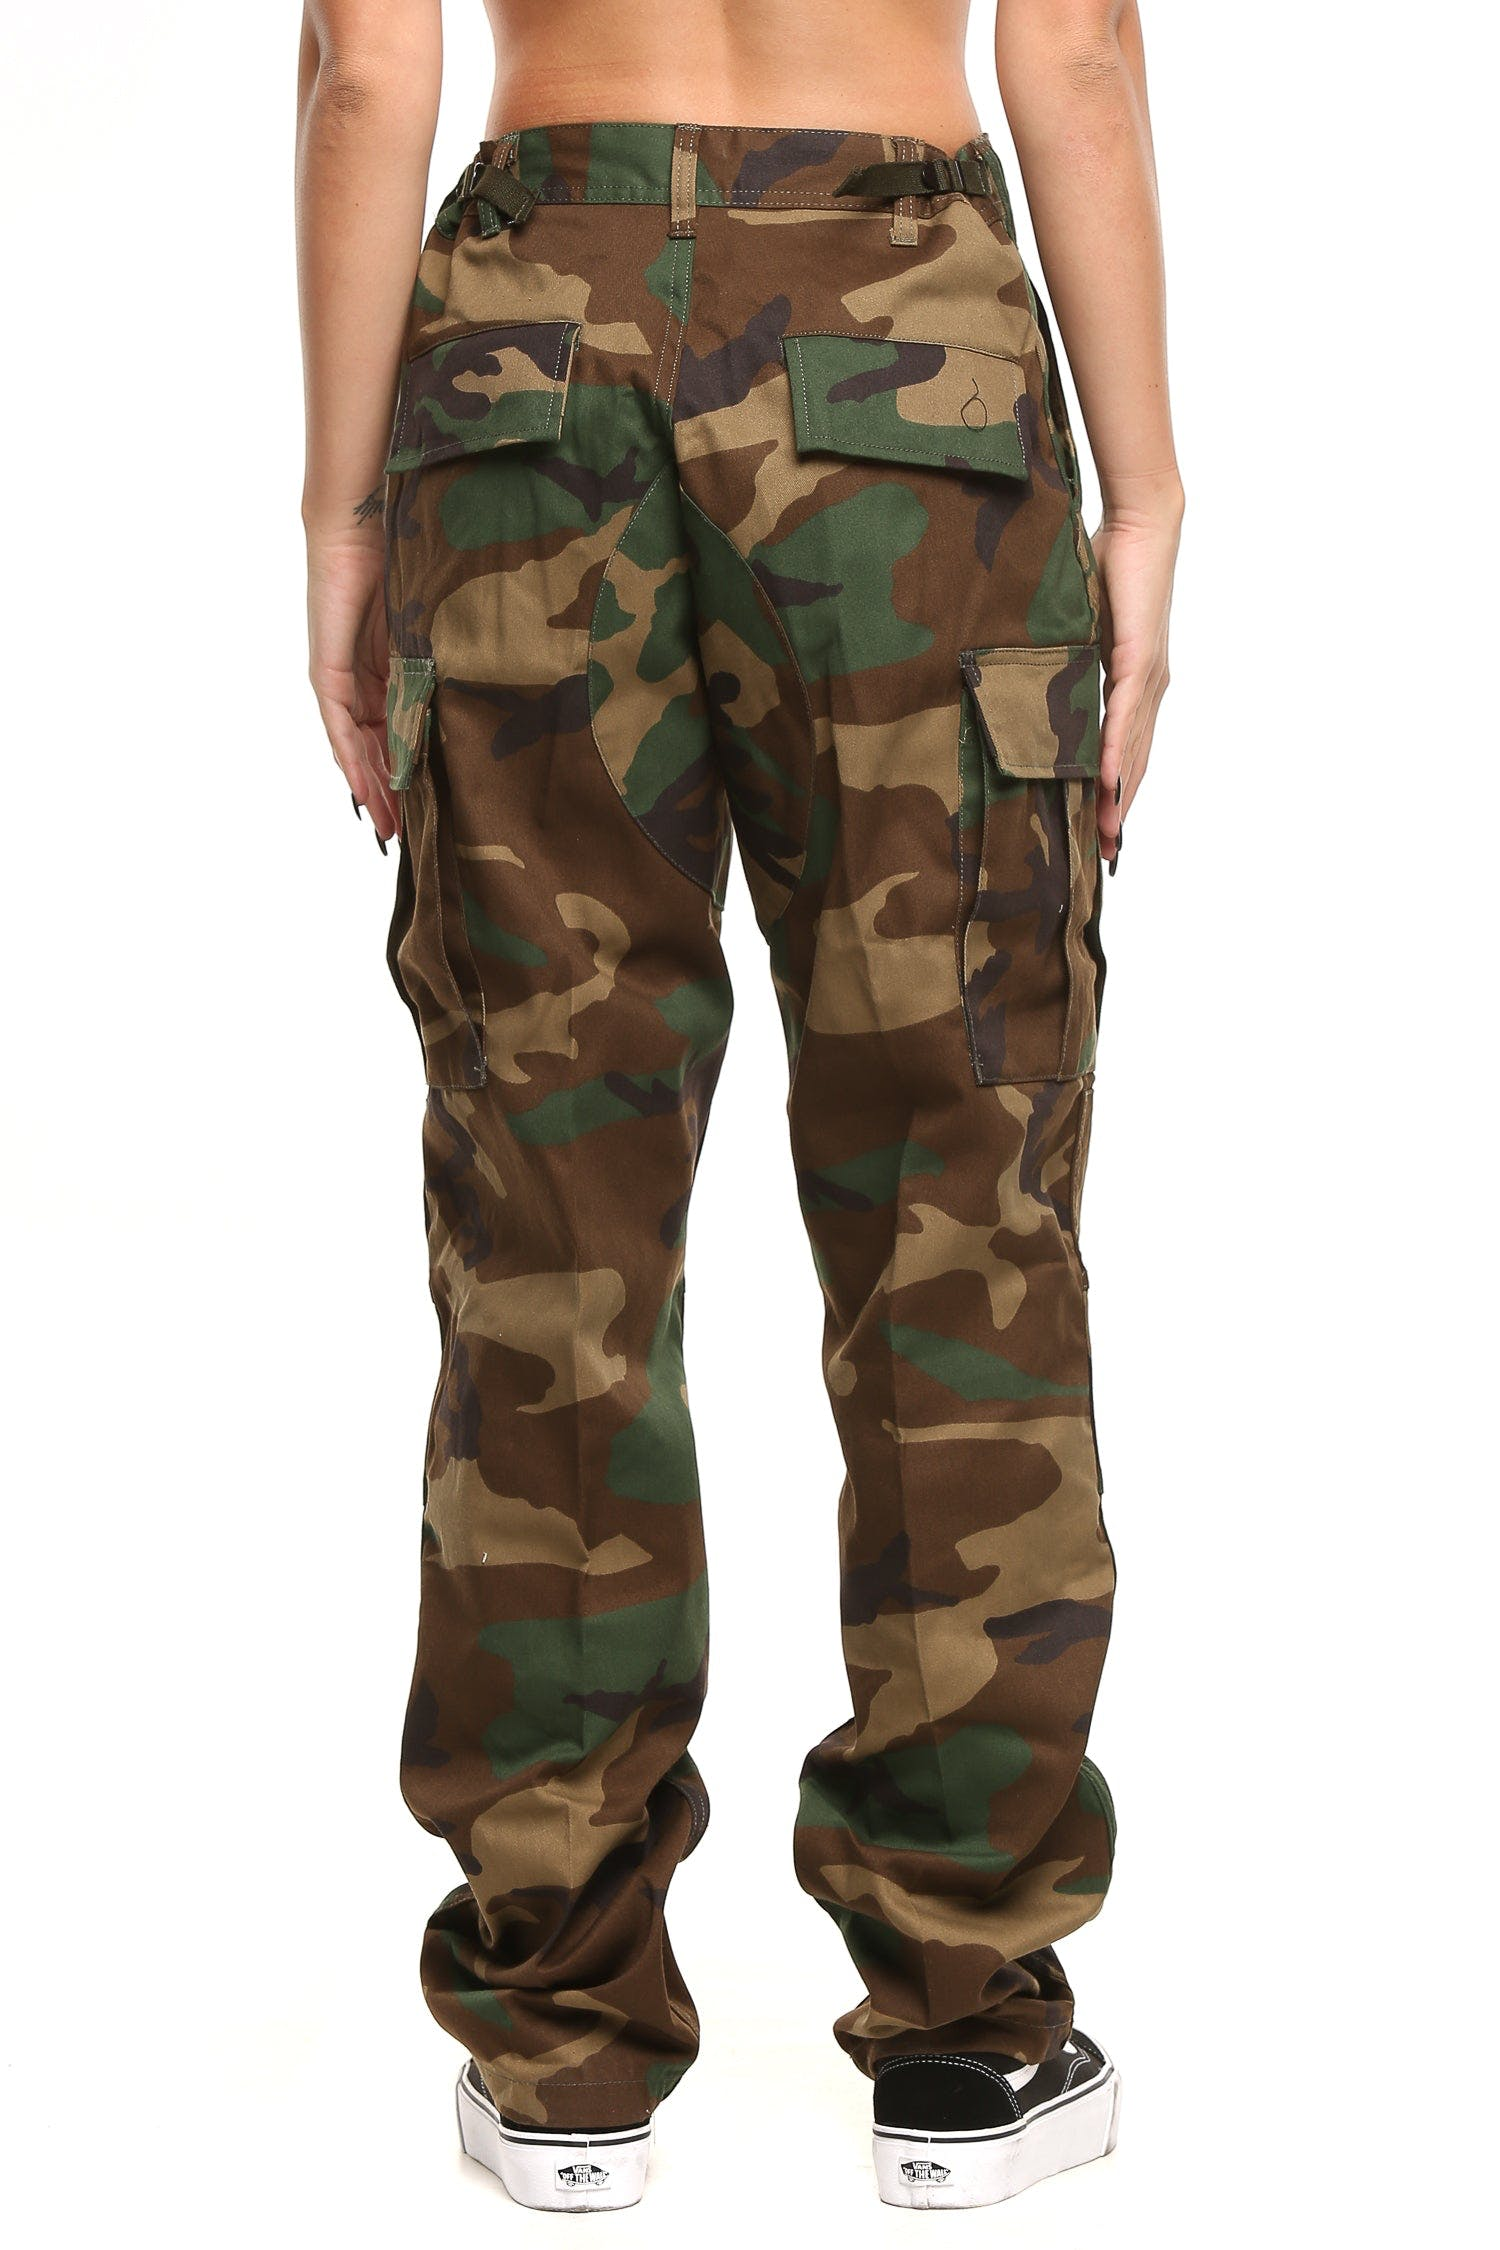 Bdu Pants For Women